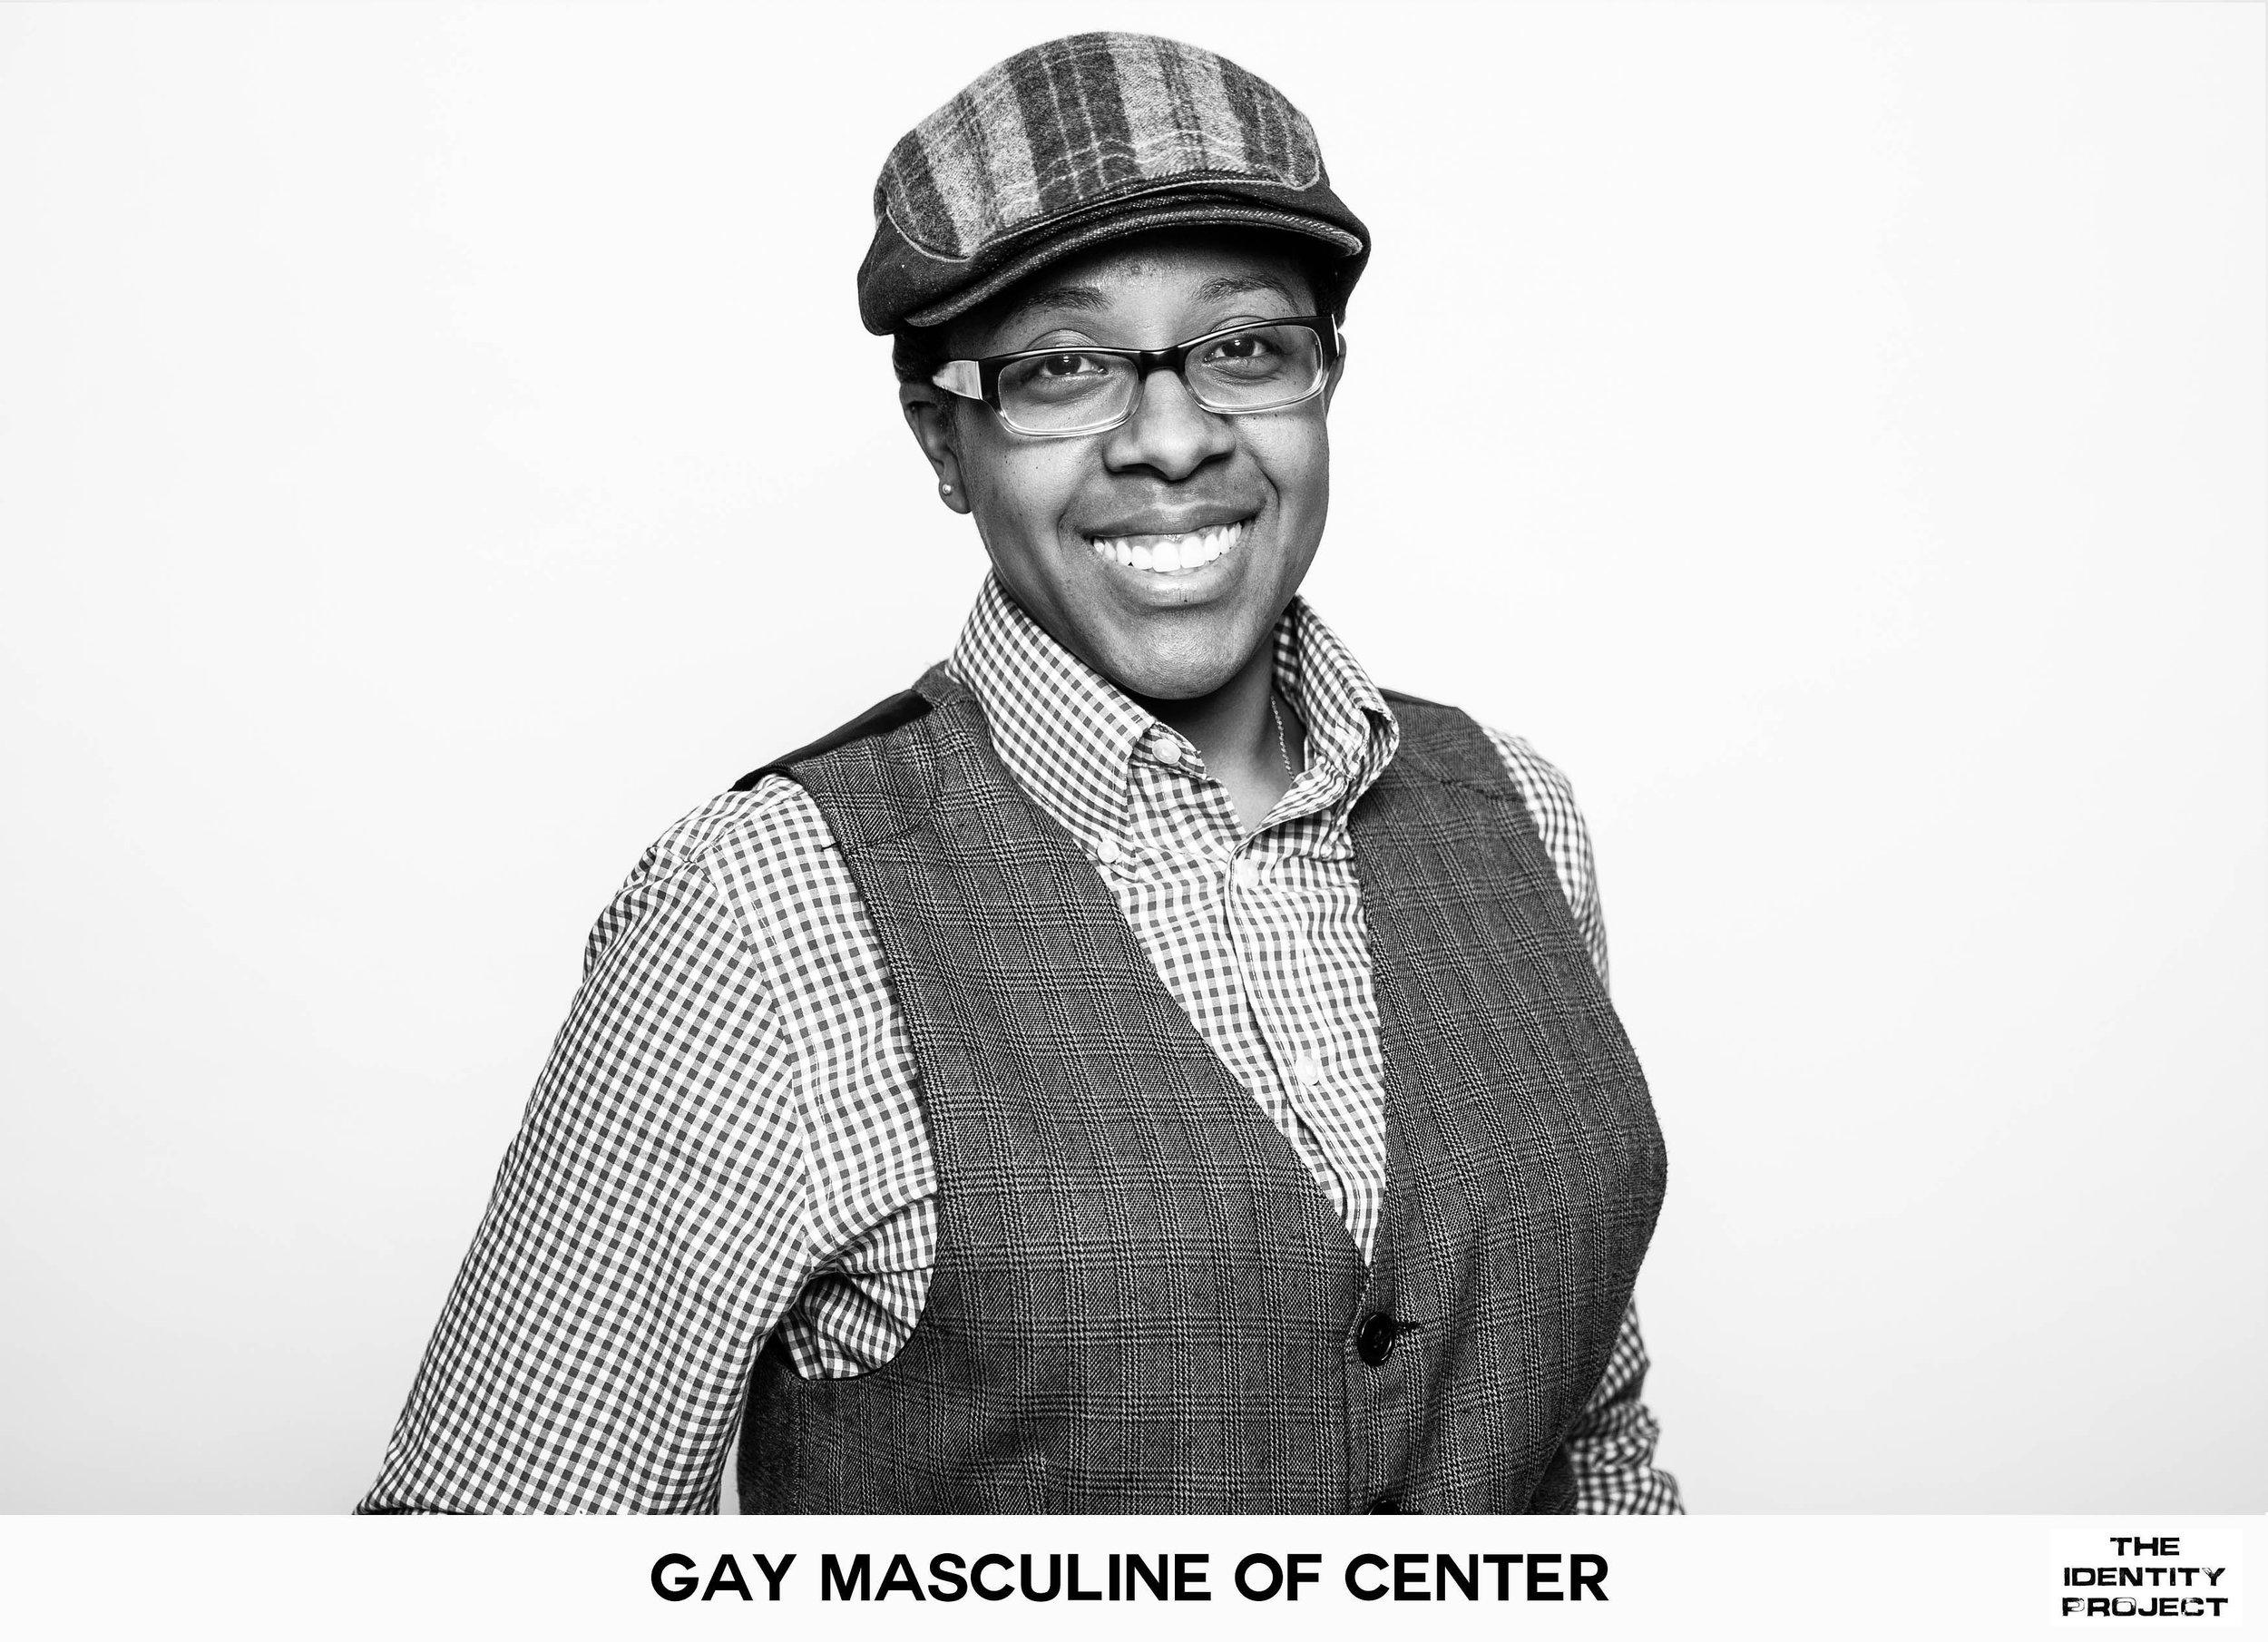 gaymasculineofcenter.jpg